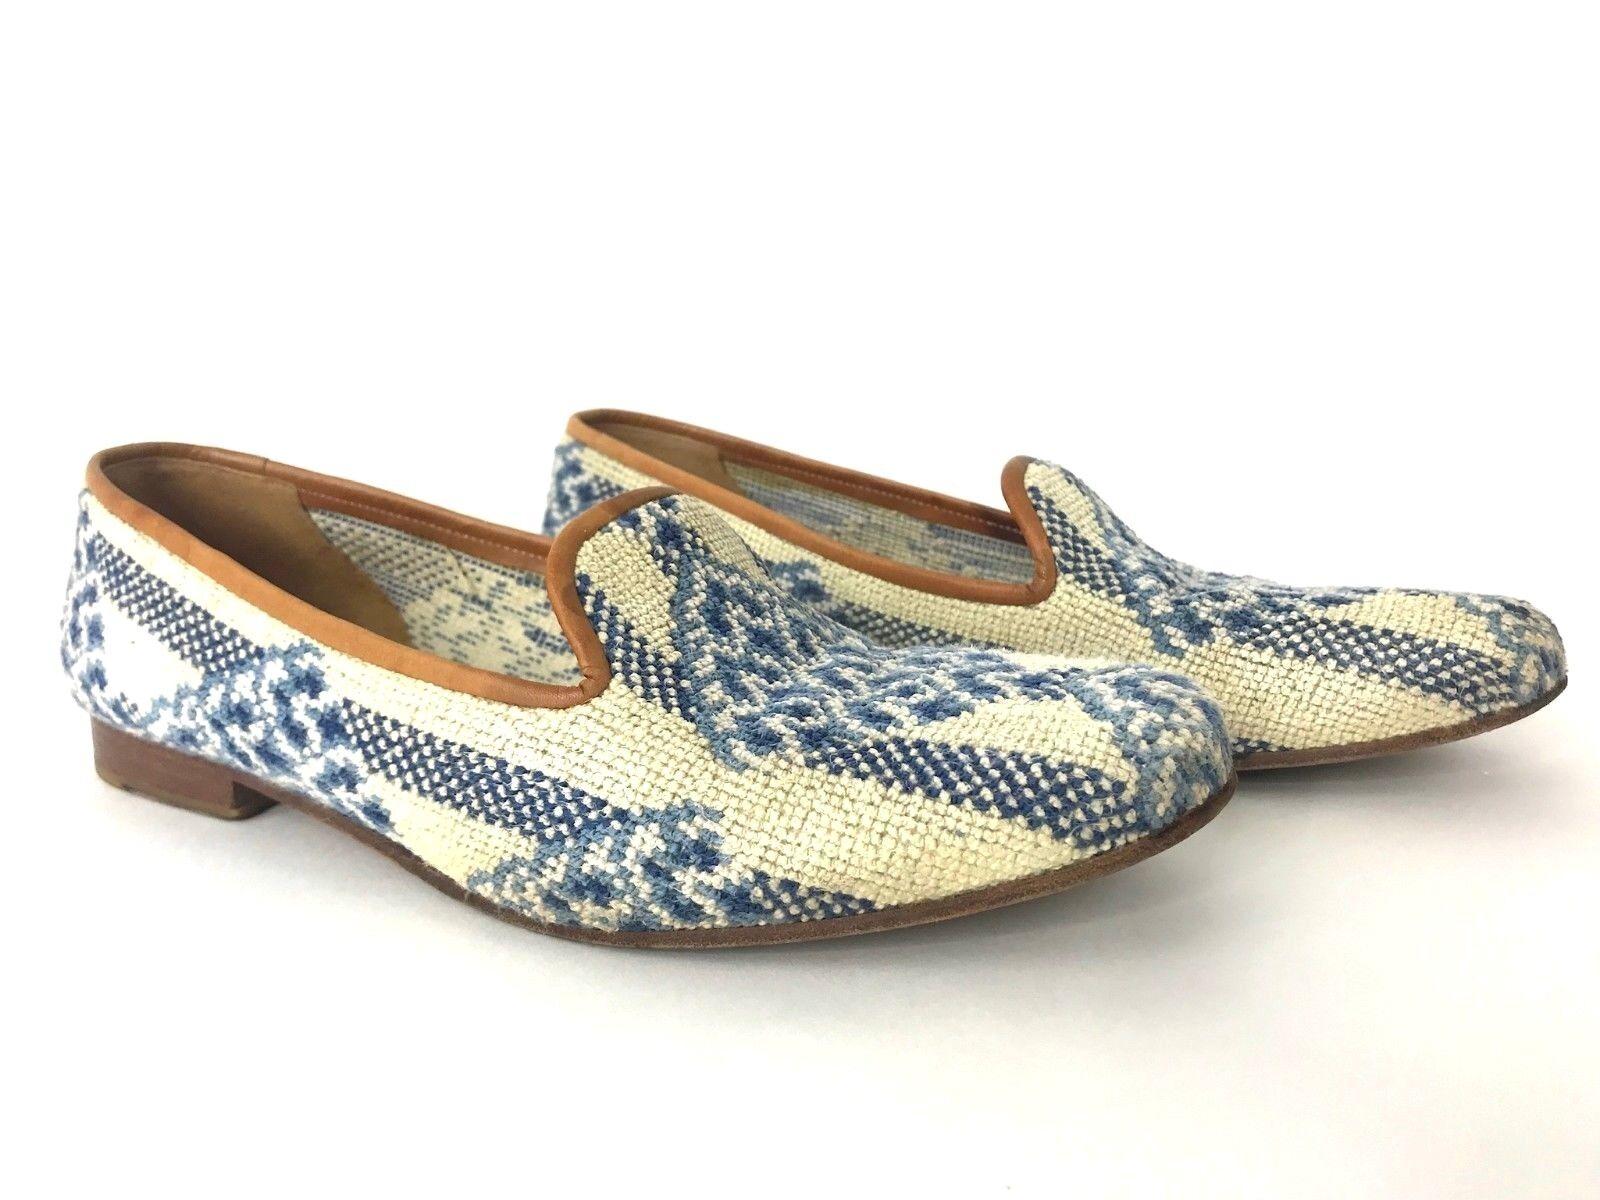 Stubbs & Wootton Women's Shoes Needlepoint Knit Leather Trim Mules SZ 9.5